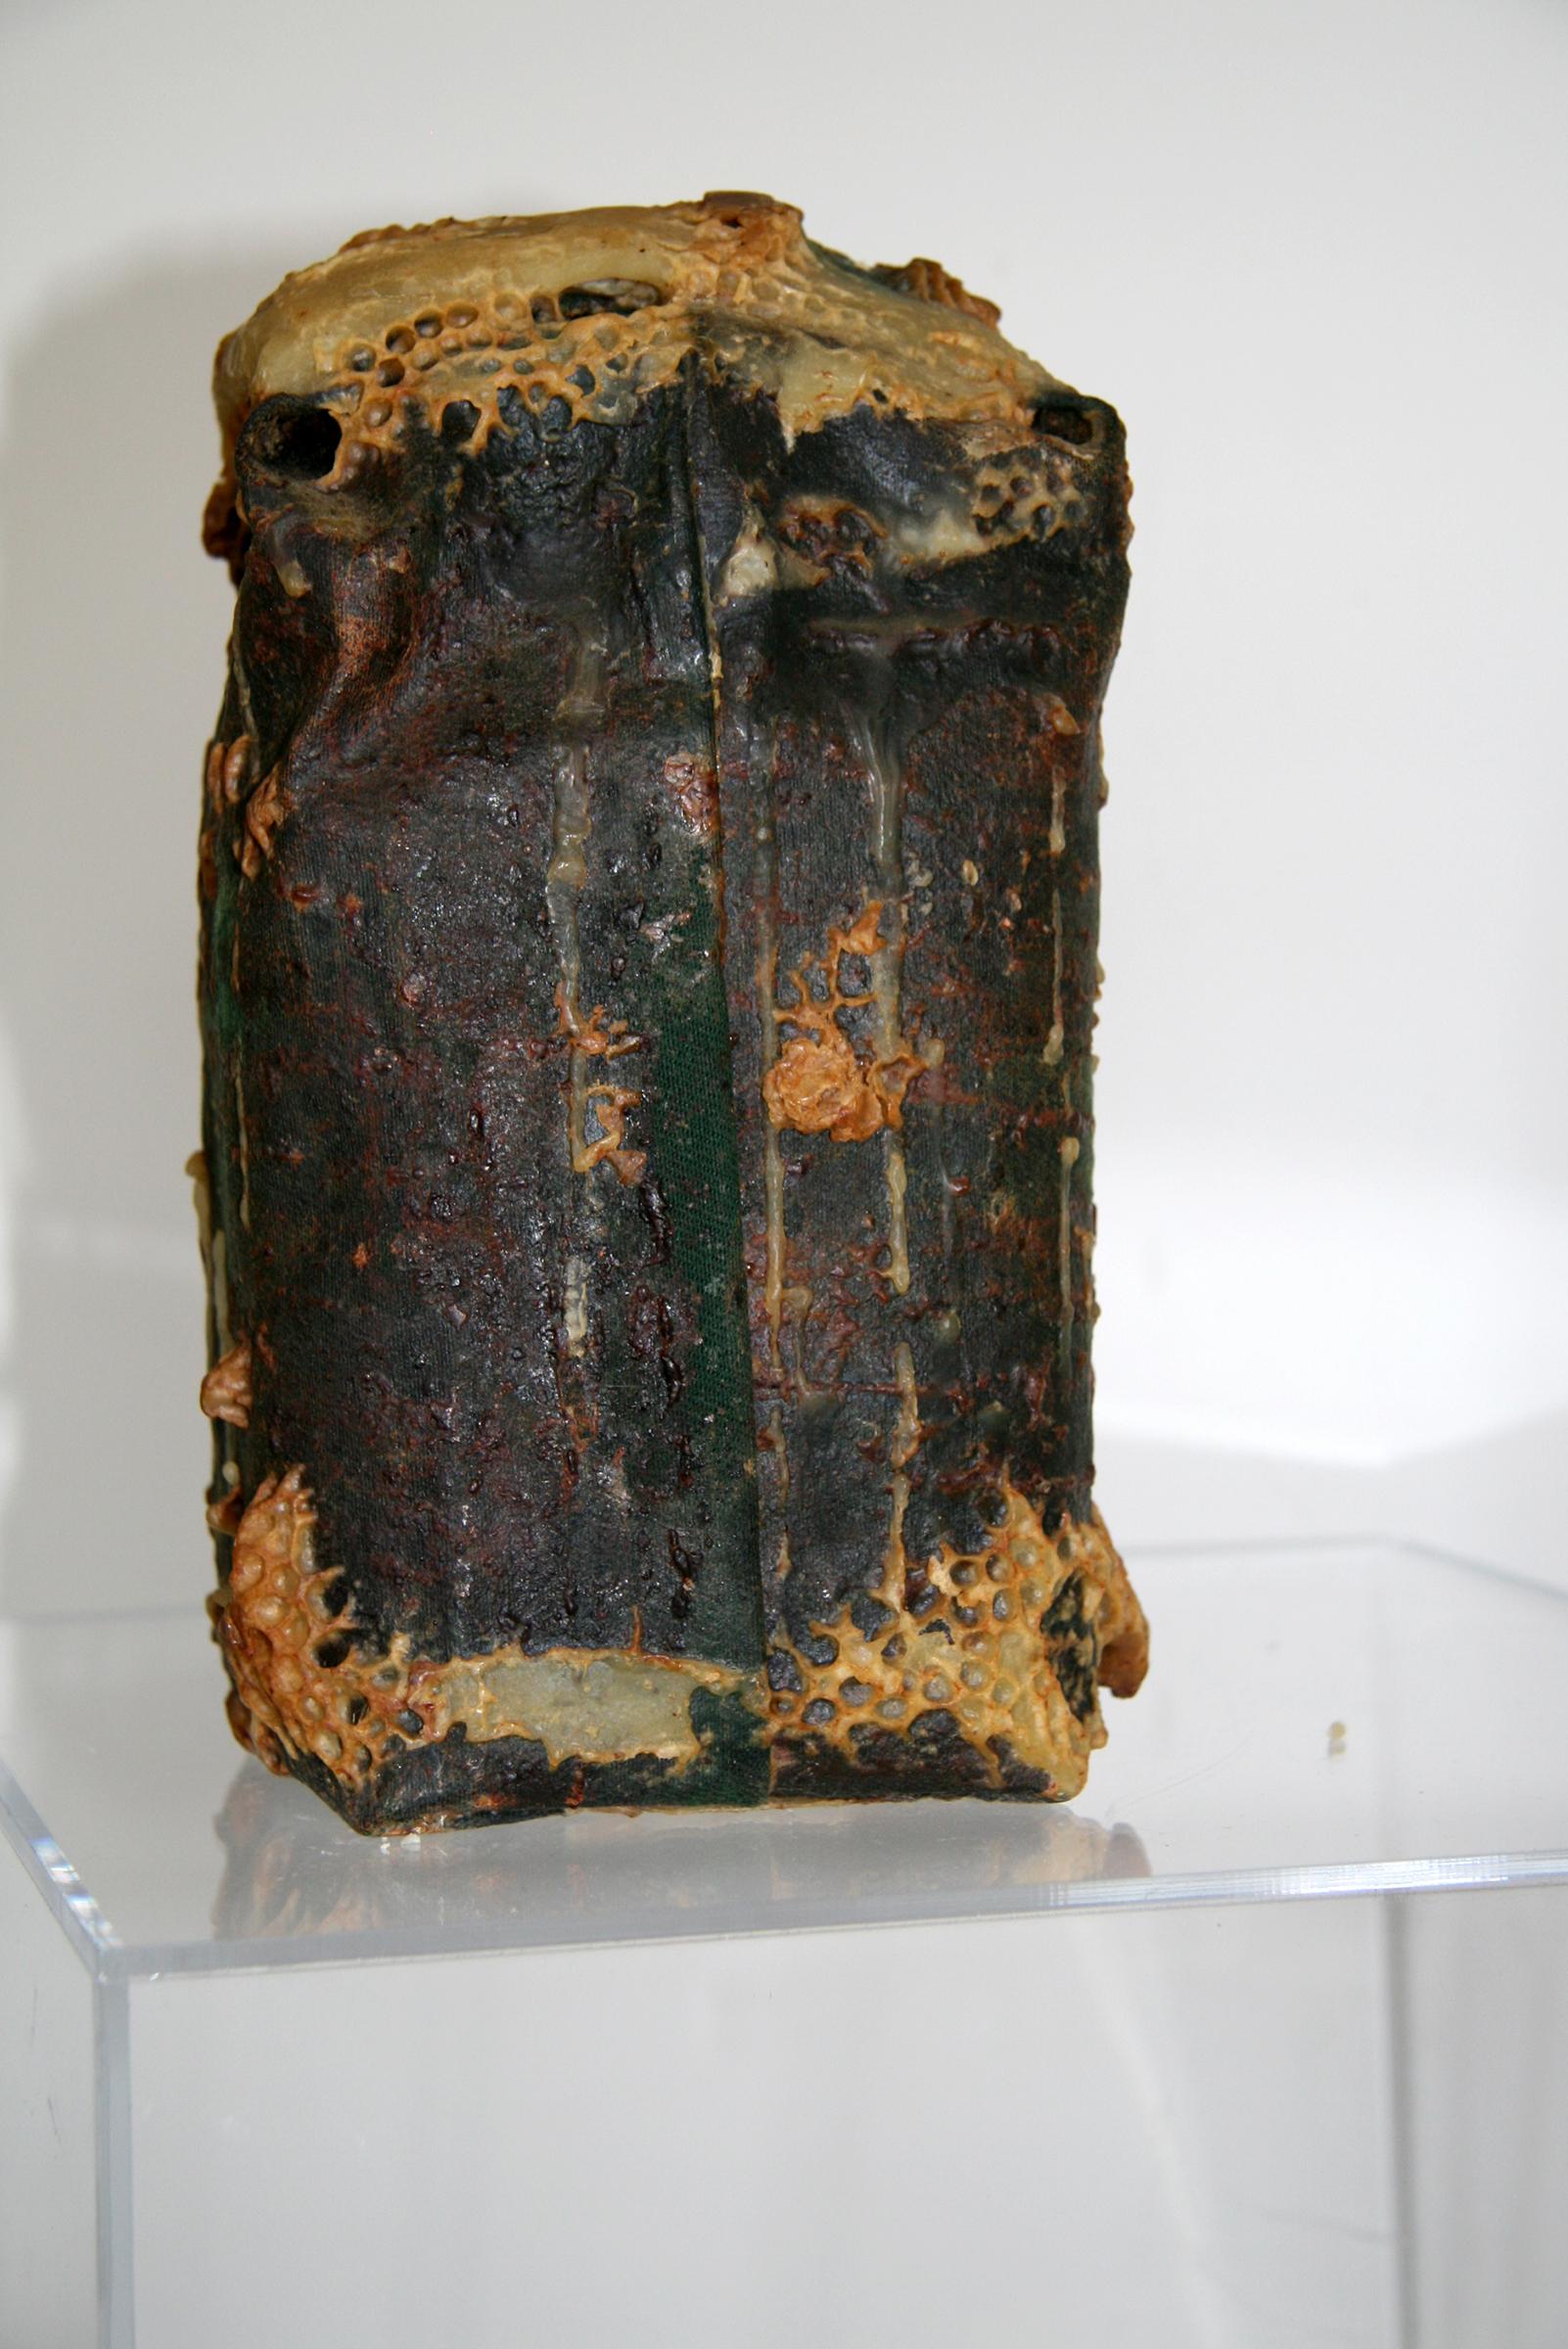 AD-019, Honey Jar, $4,500